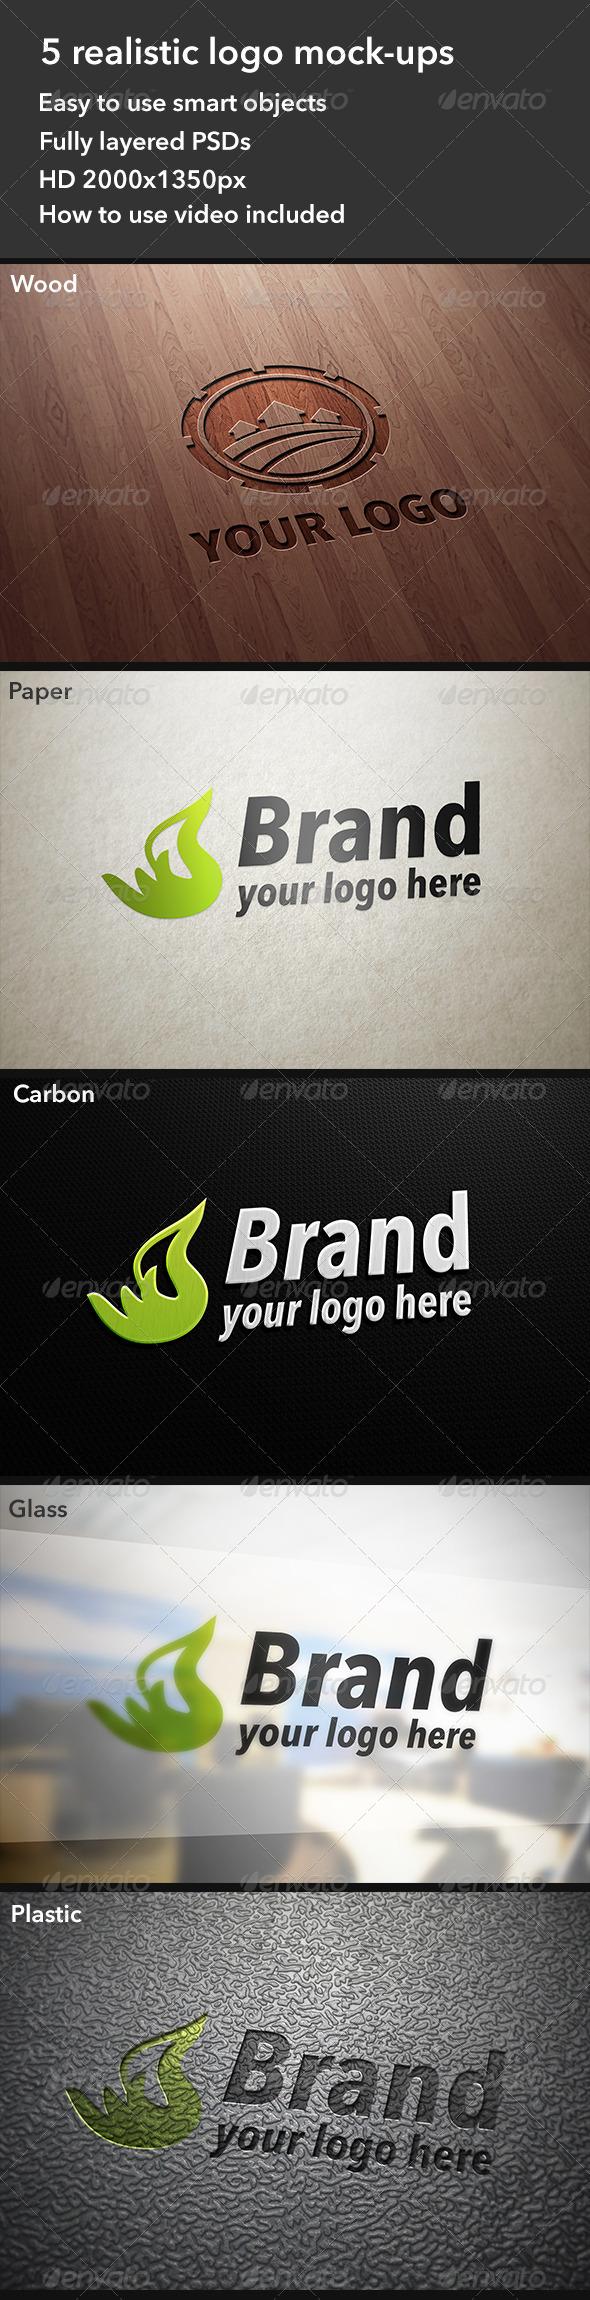 5 Realistic Logo Mockups - Product Mock-Ups Graphics